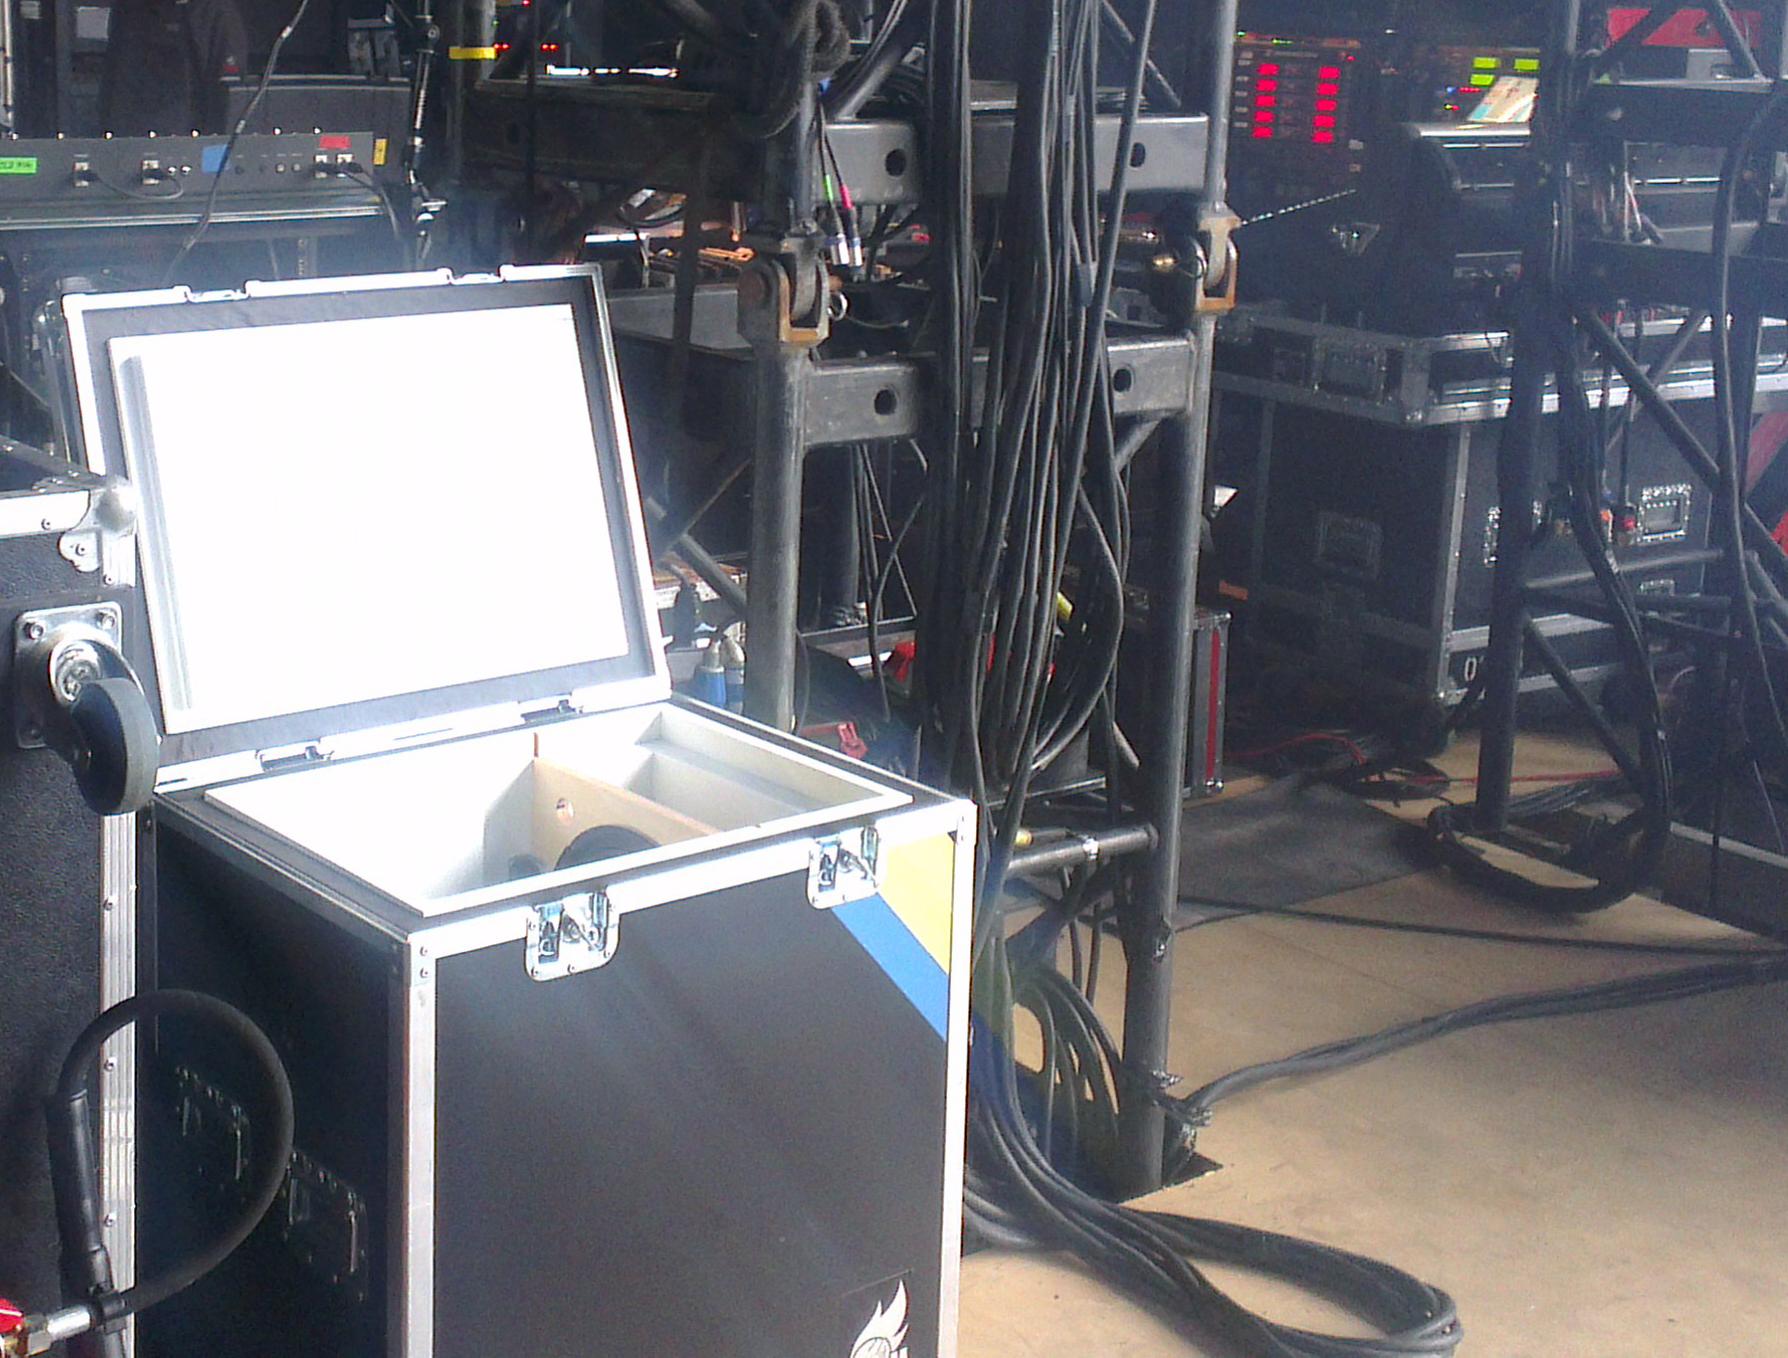 Box of Doom live gear Rammstein Fortarock